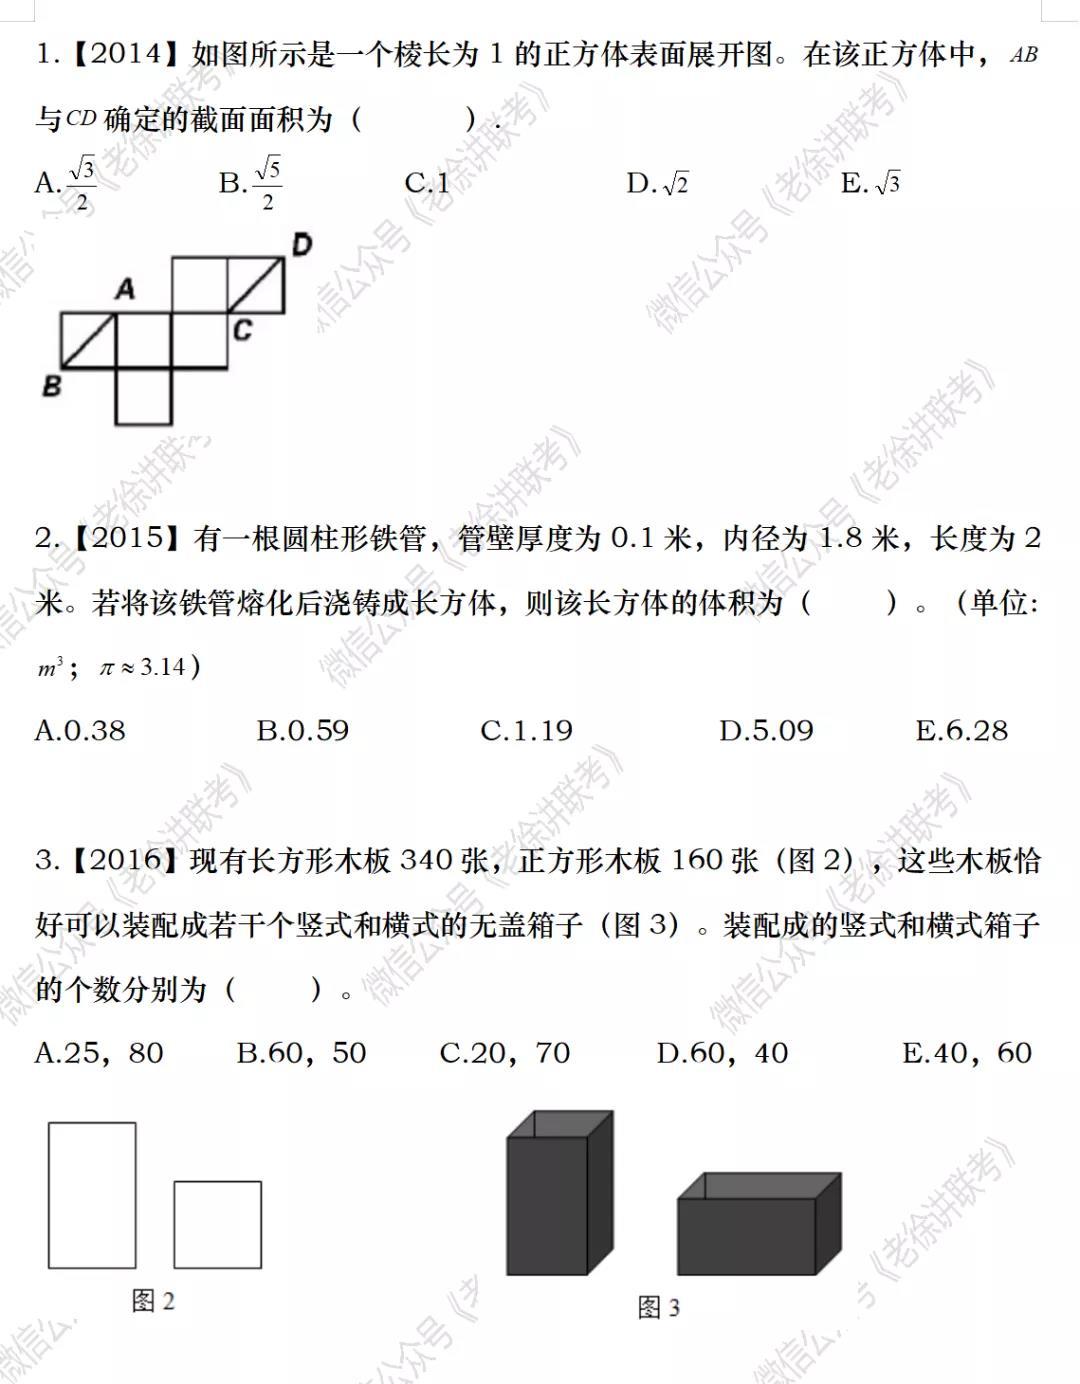 2022MBA考研|管理类联考:数学专题训练-立体几何(第五期)